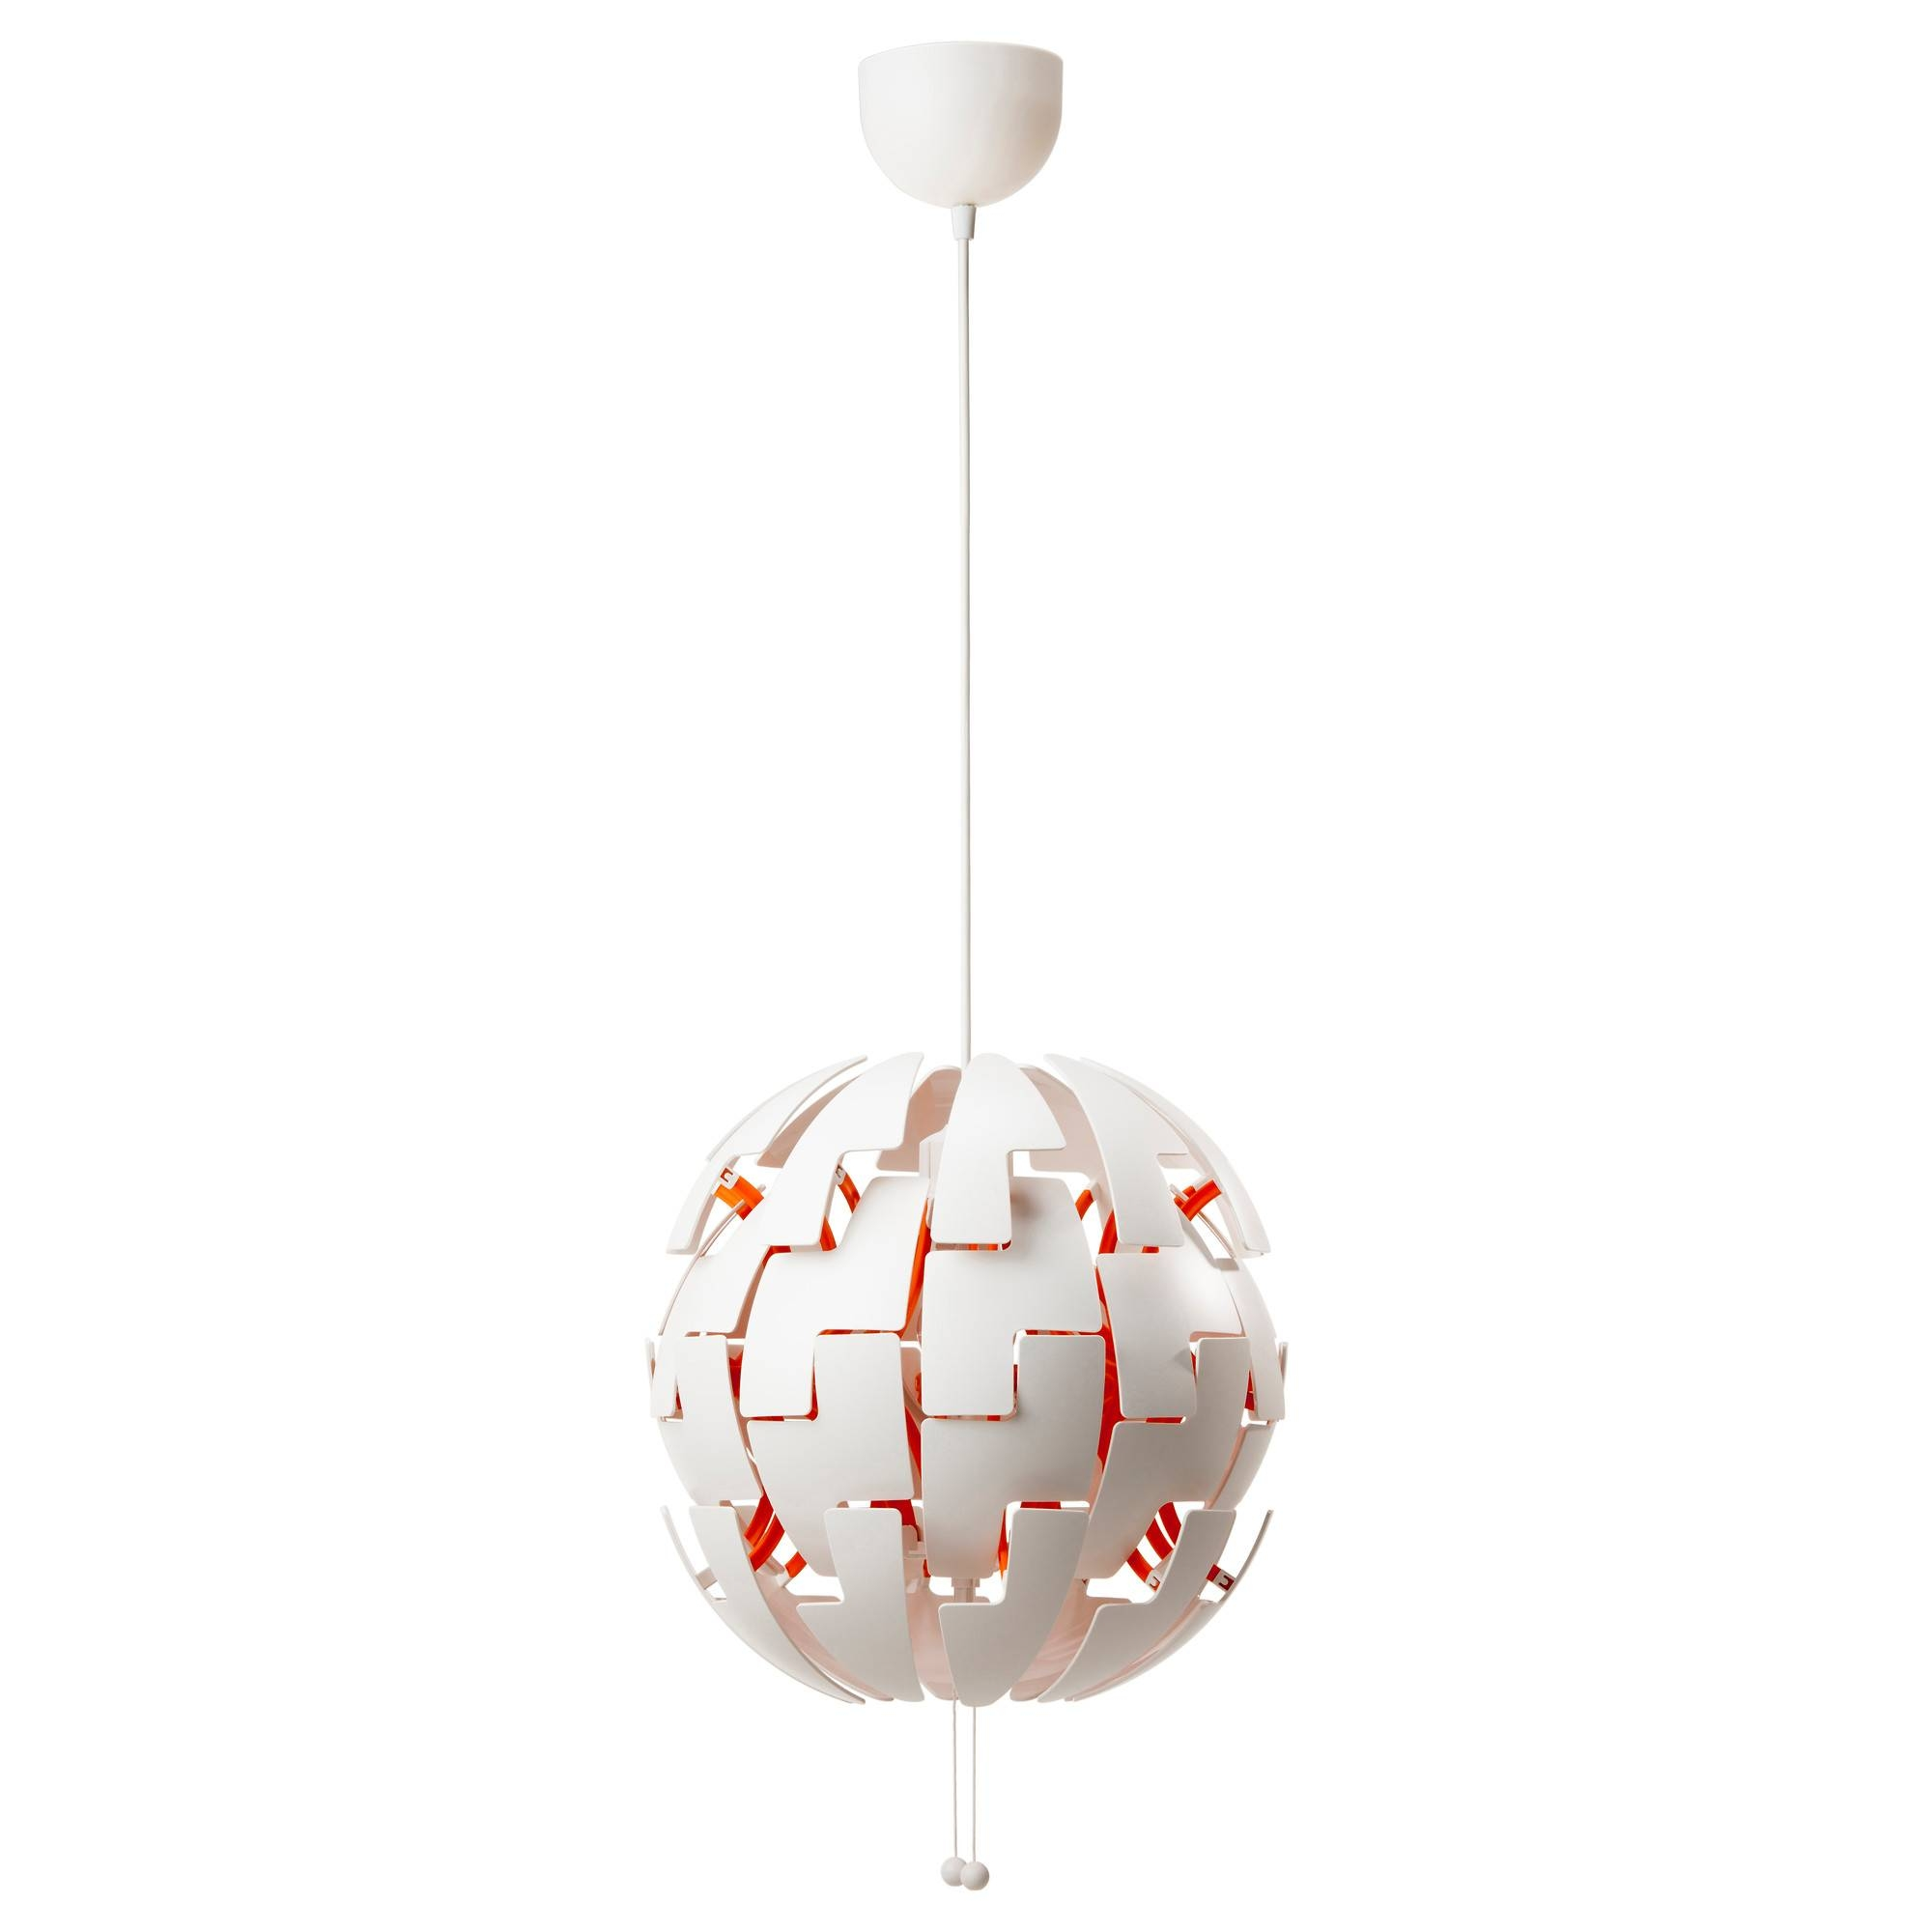 Ikea Ps 2014 Pendant Lamp White/orange - Ikea for Ikea Ceiling Lights Fittings (Image 10 of 15)